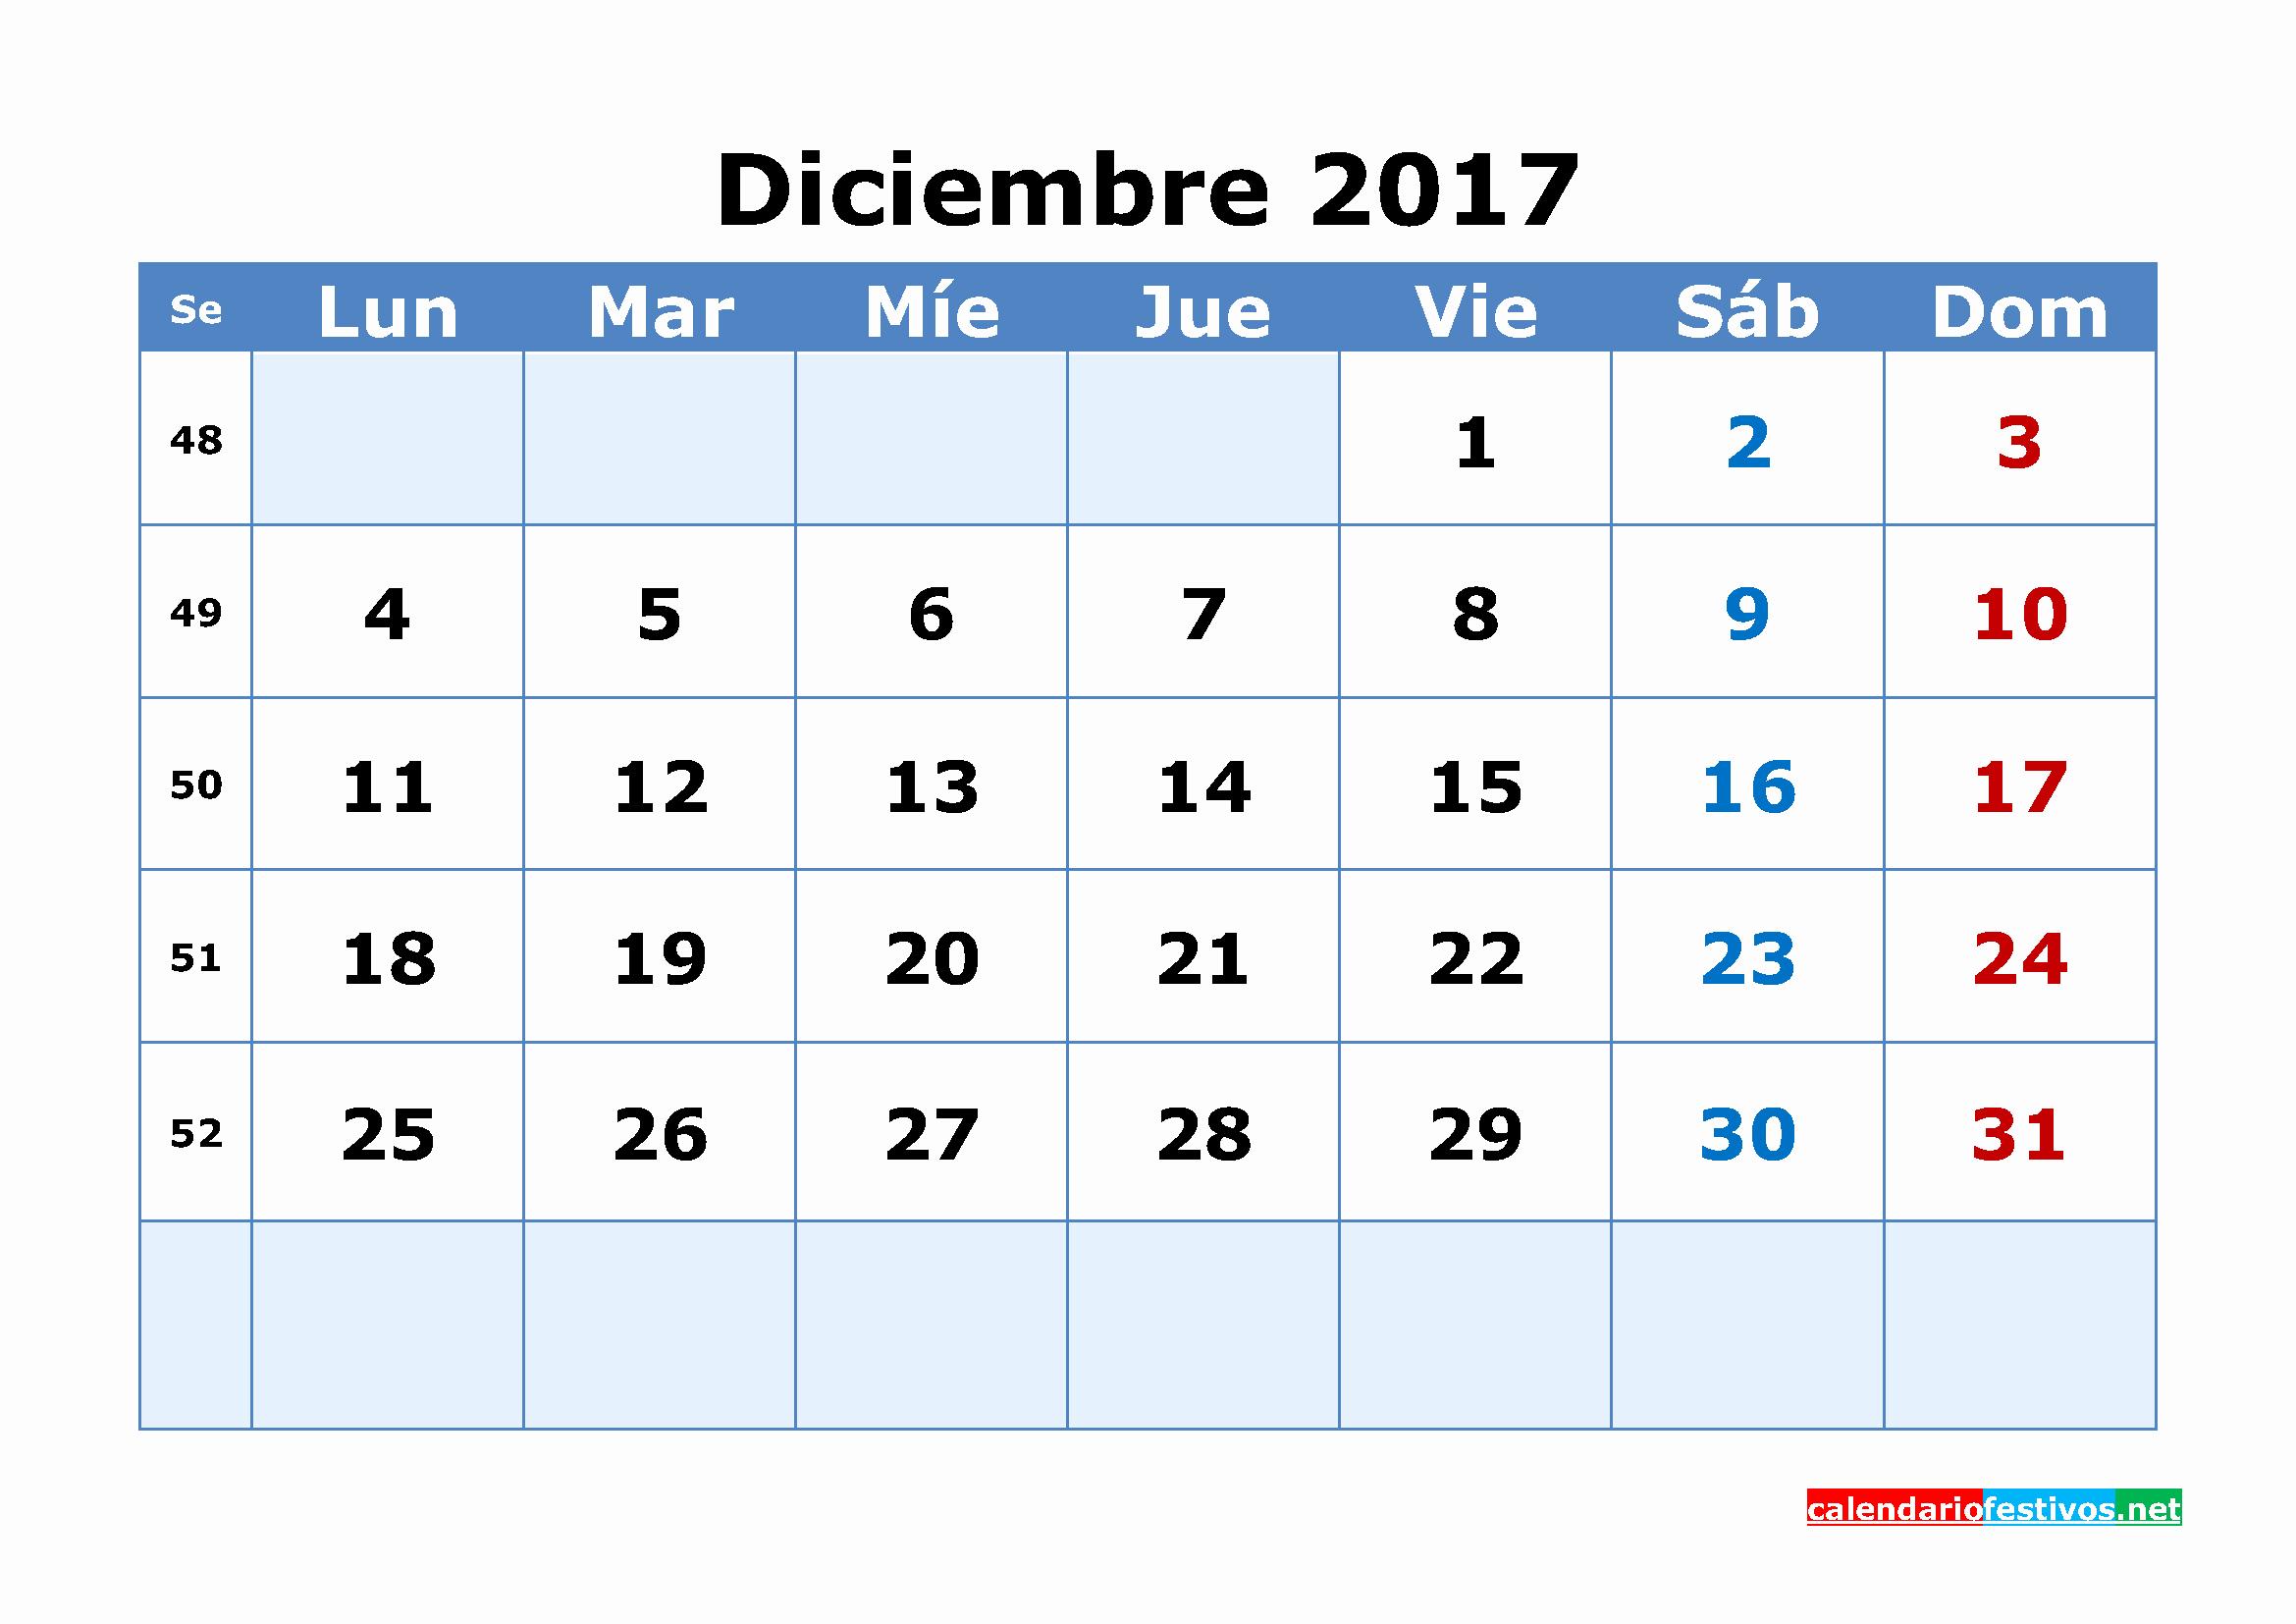 Calendario Diciembre 2017 Para Imprimir Best Of Calendario 2017 Diciembre Para Imprimir 3